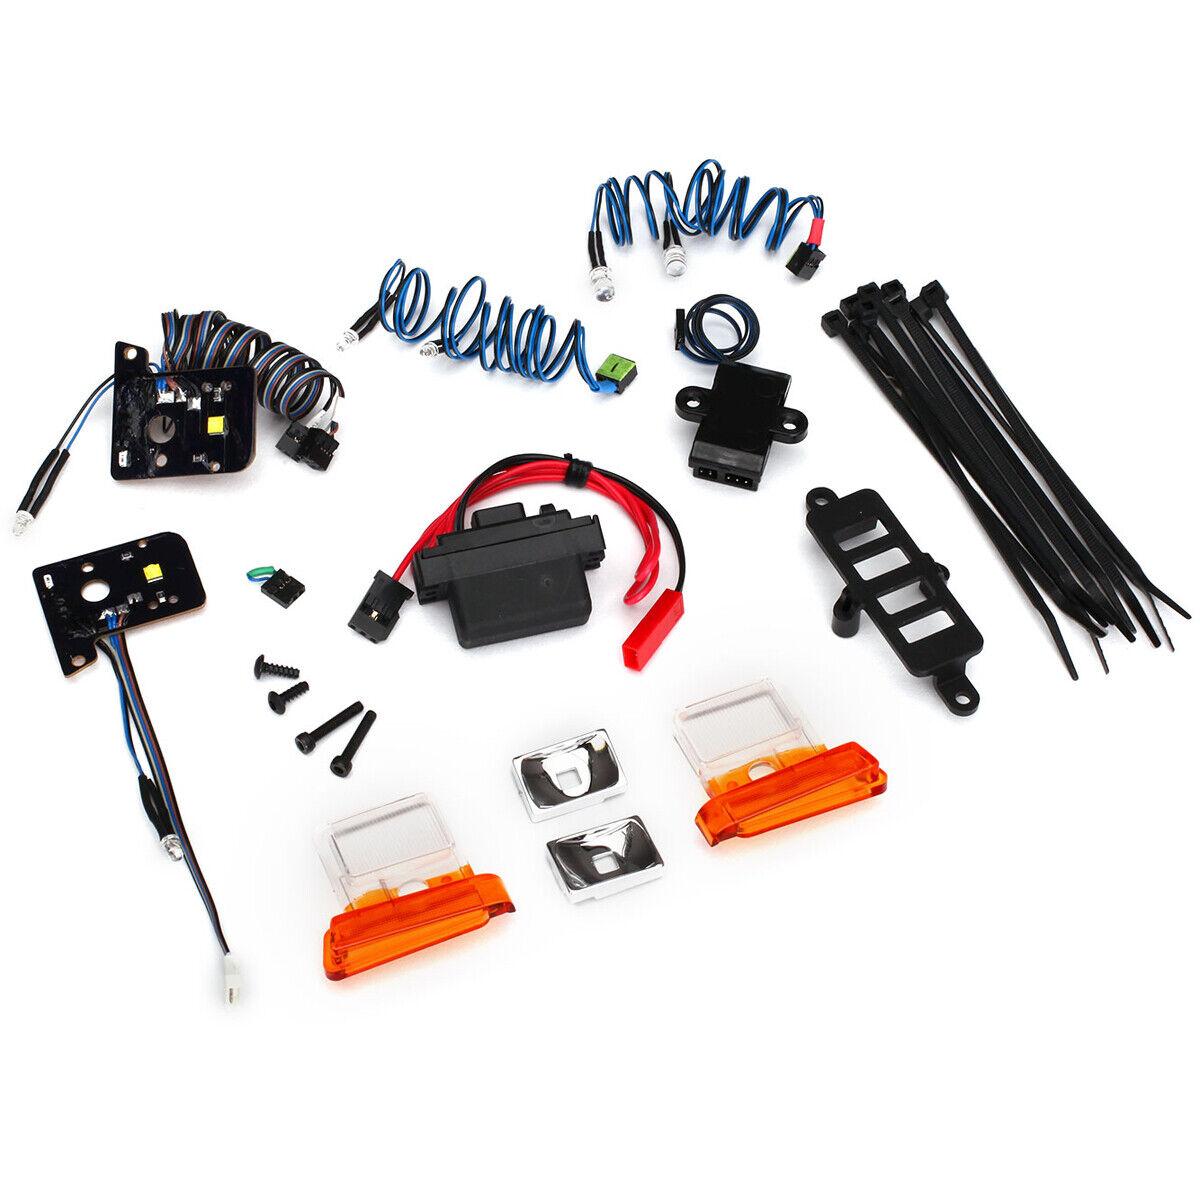 Traxxas 8035 - Bronco LED Light Set w Headlights, Tail Lights & Module